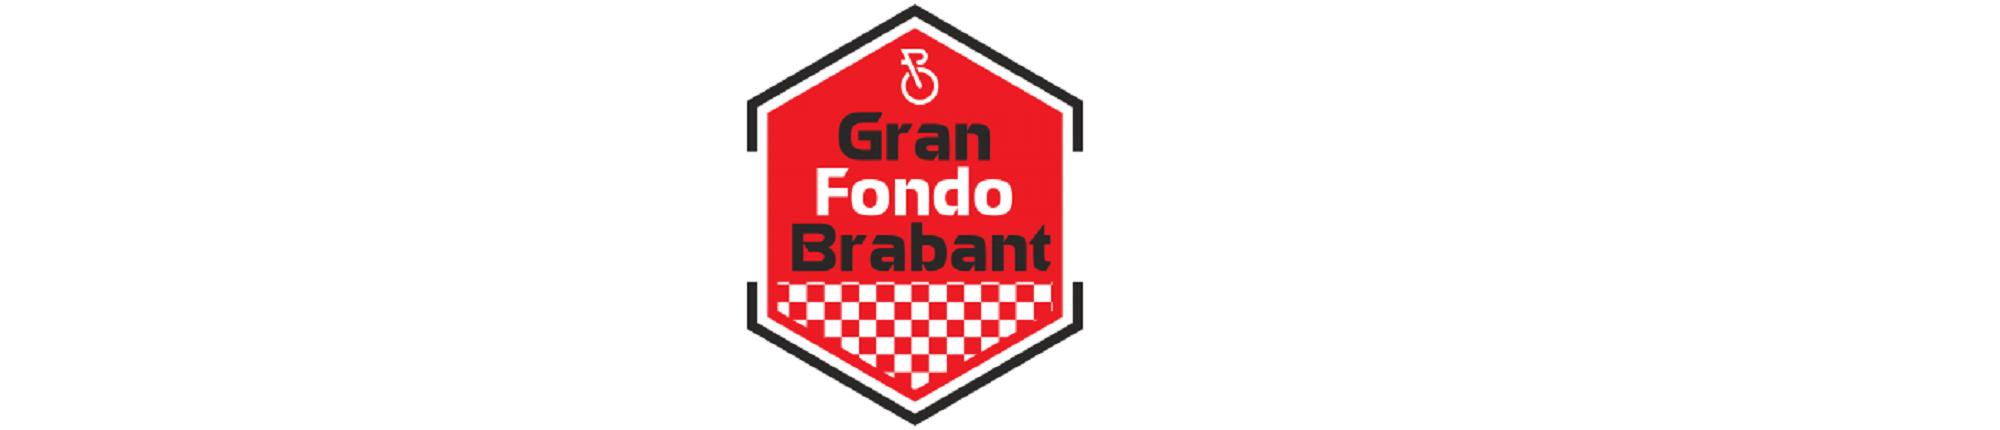 Wielerronde Gran Fondo Brabant 2019 – Den Bosch